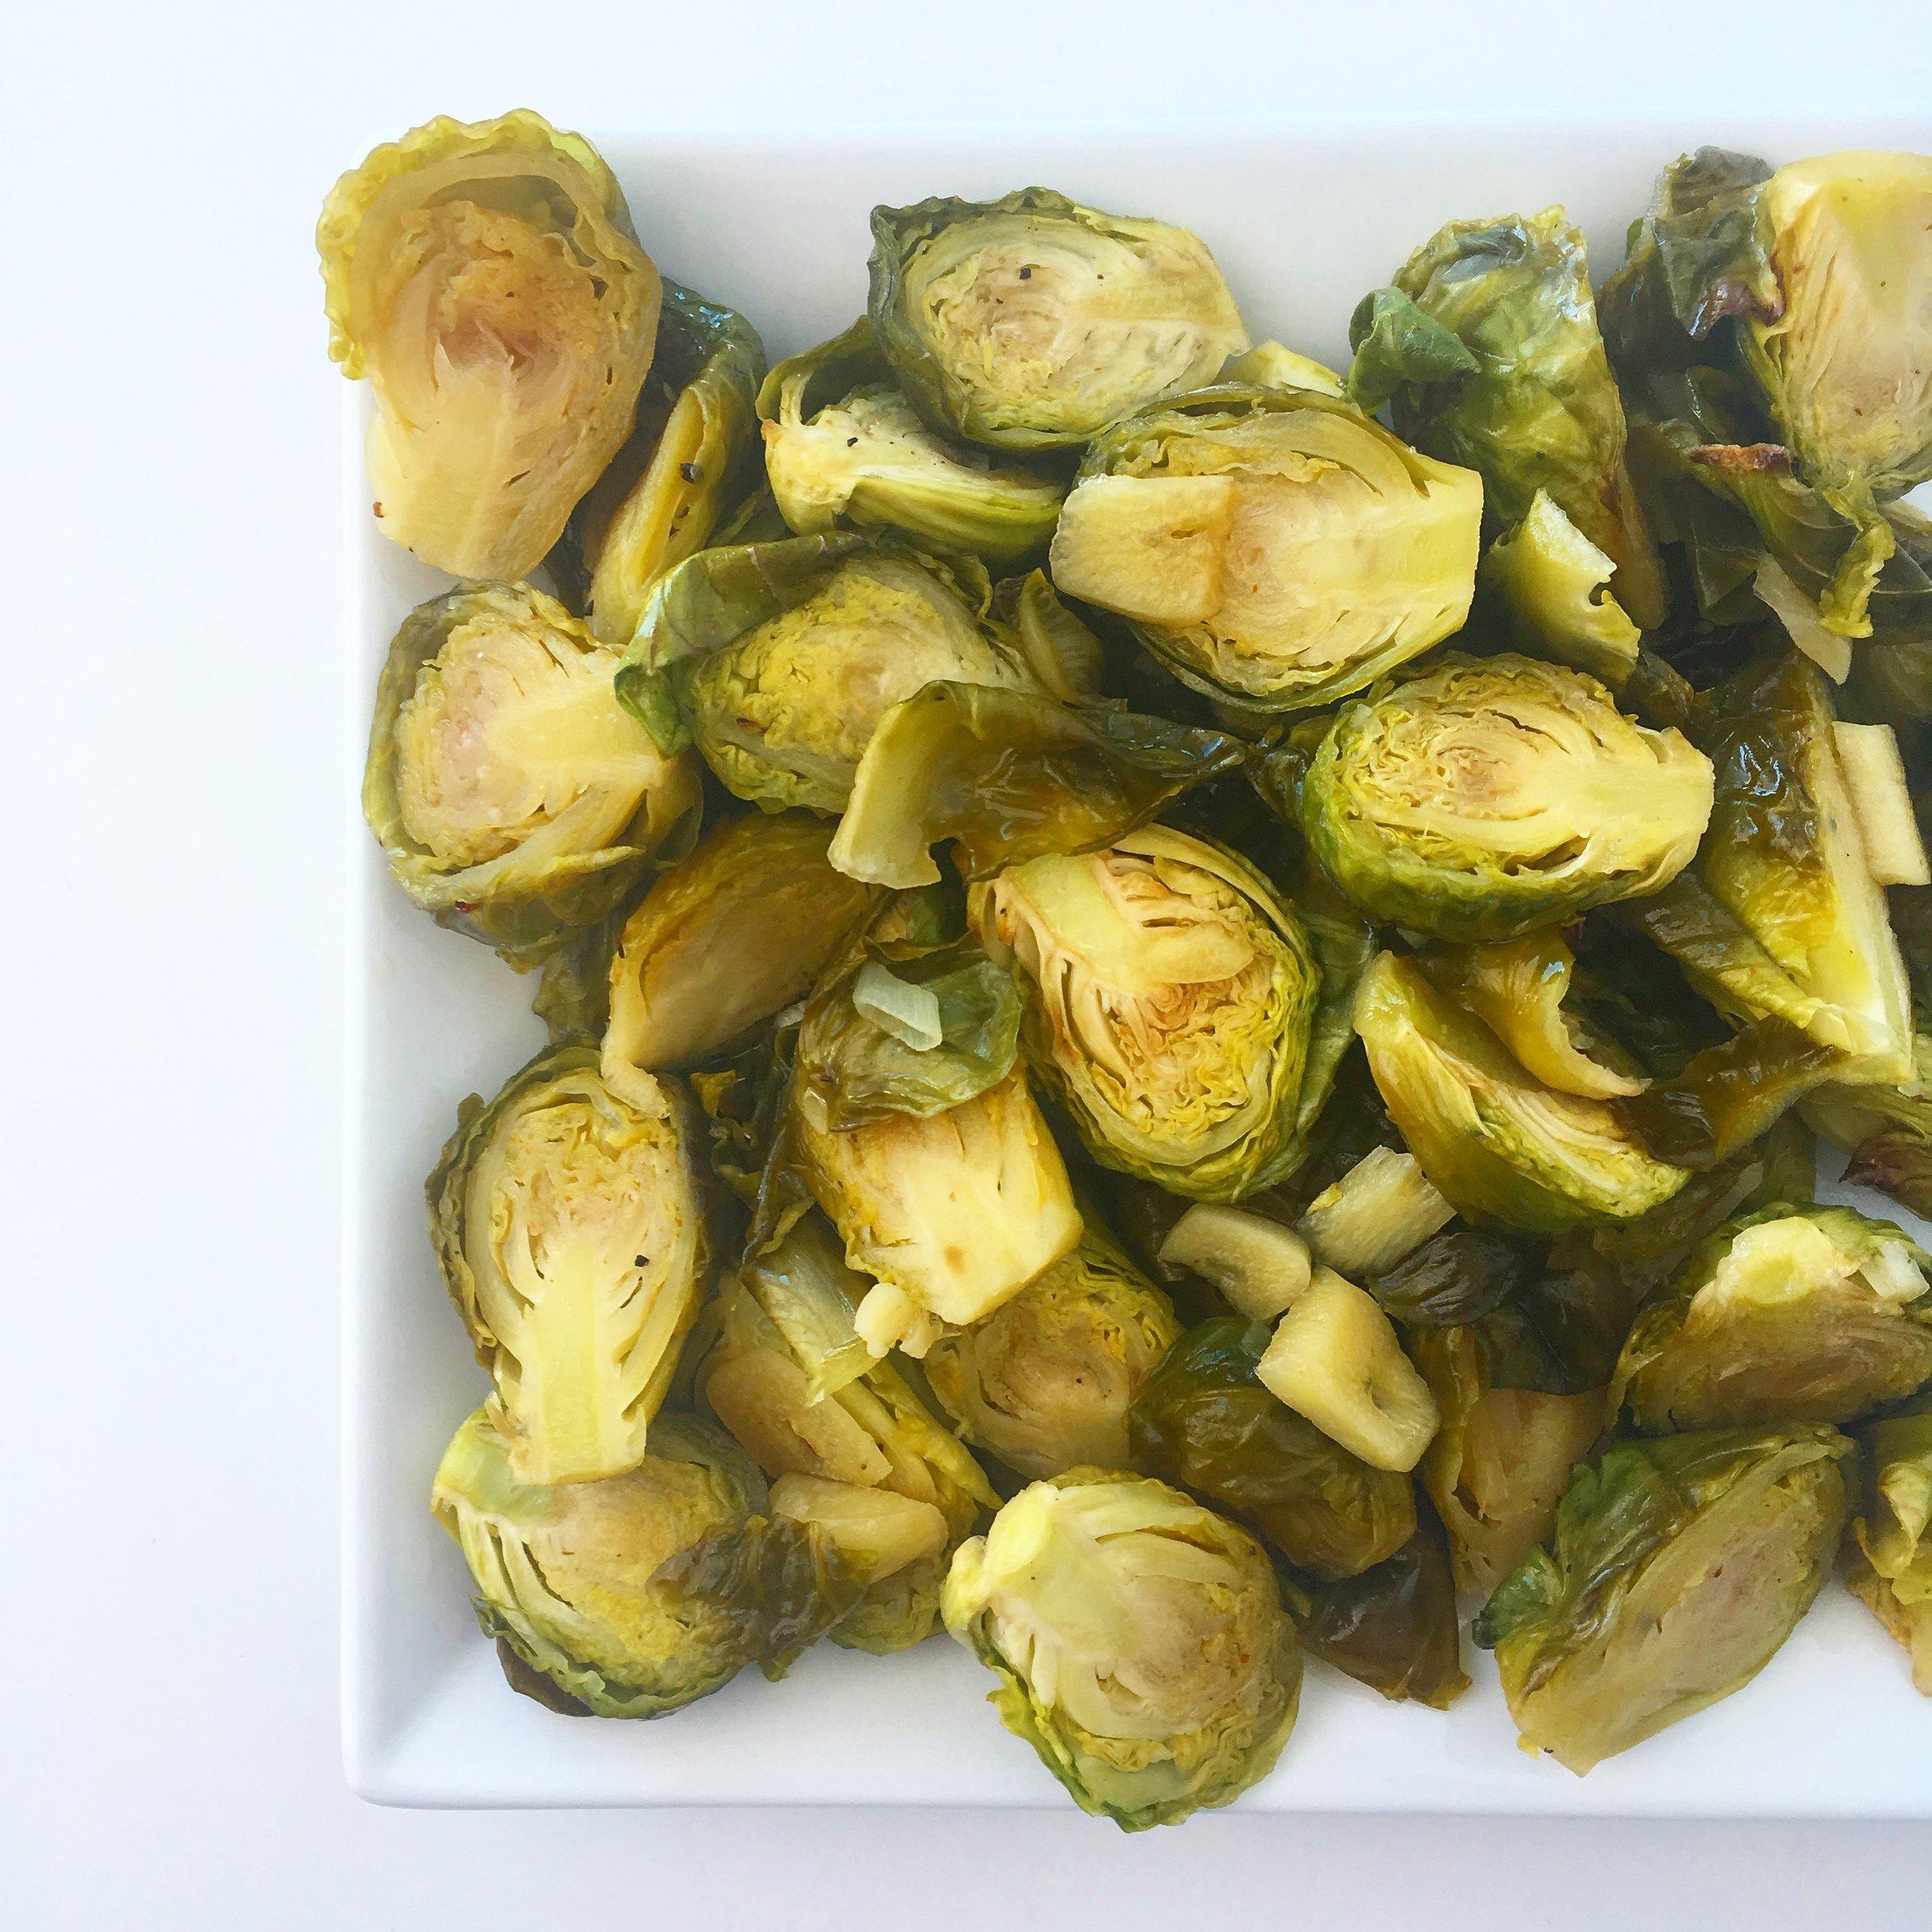 Roasted-Honey-Garlic-Brussels-Sprouts.JPG